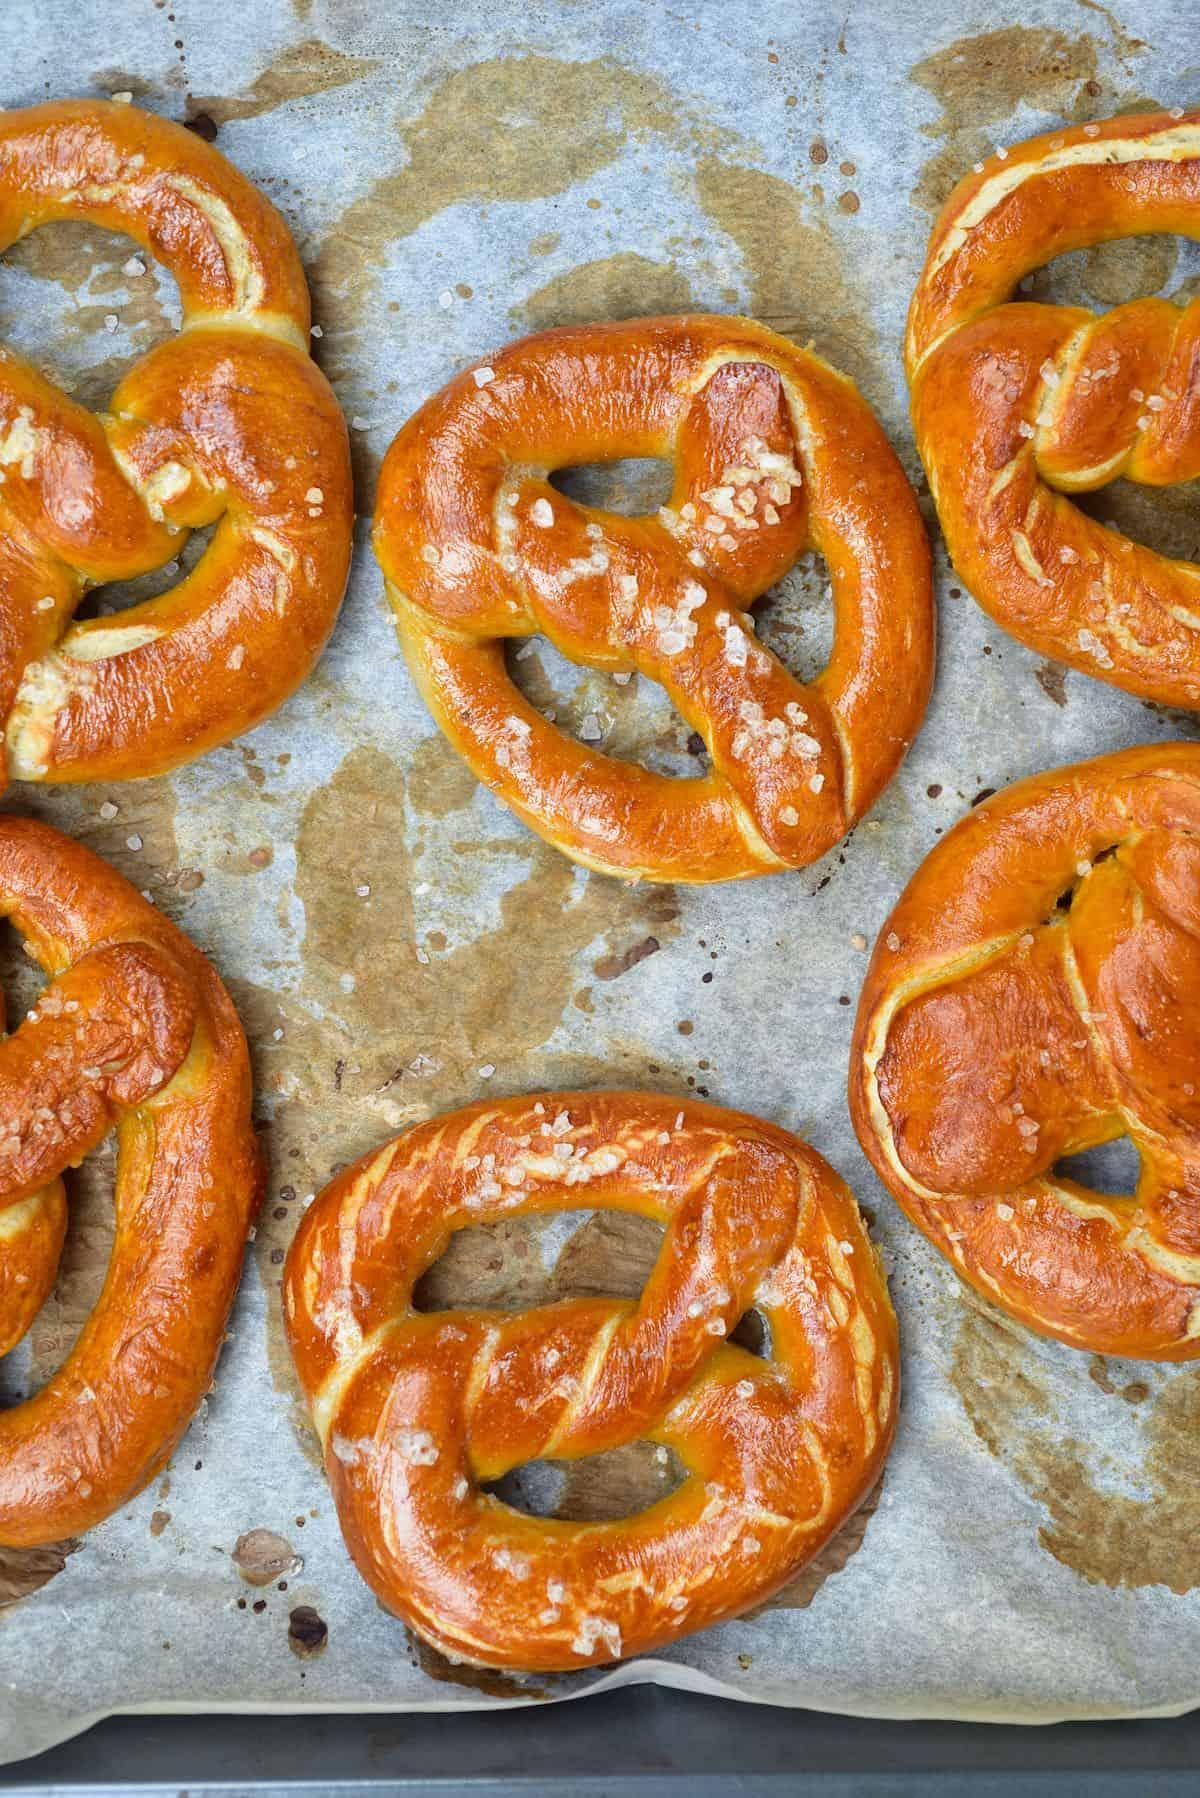 Freshly baked pretzels on a baking tray